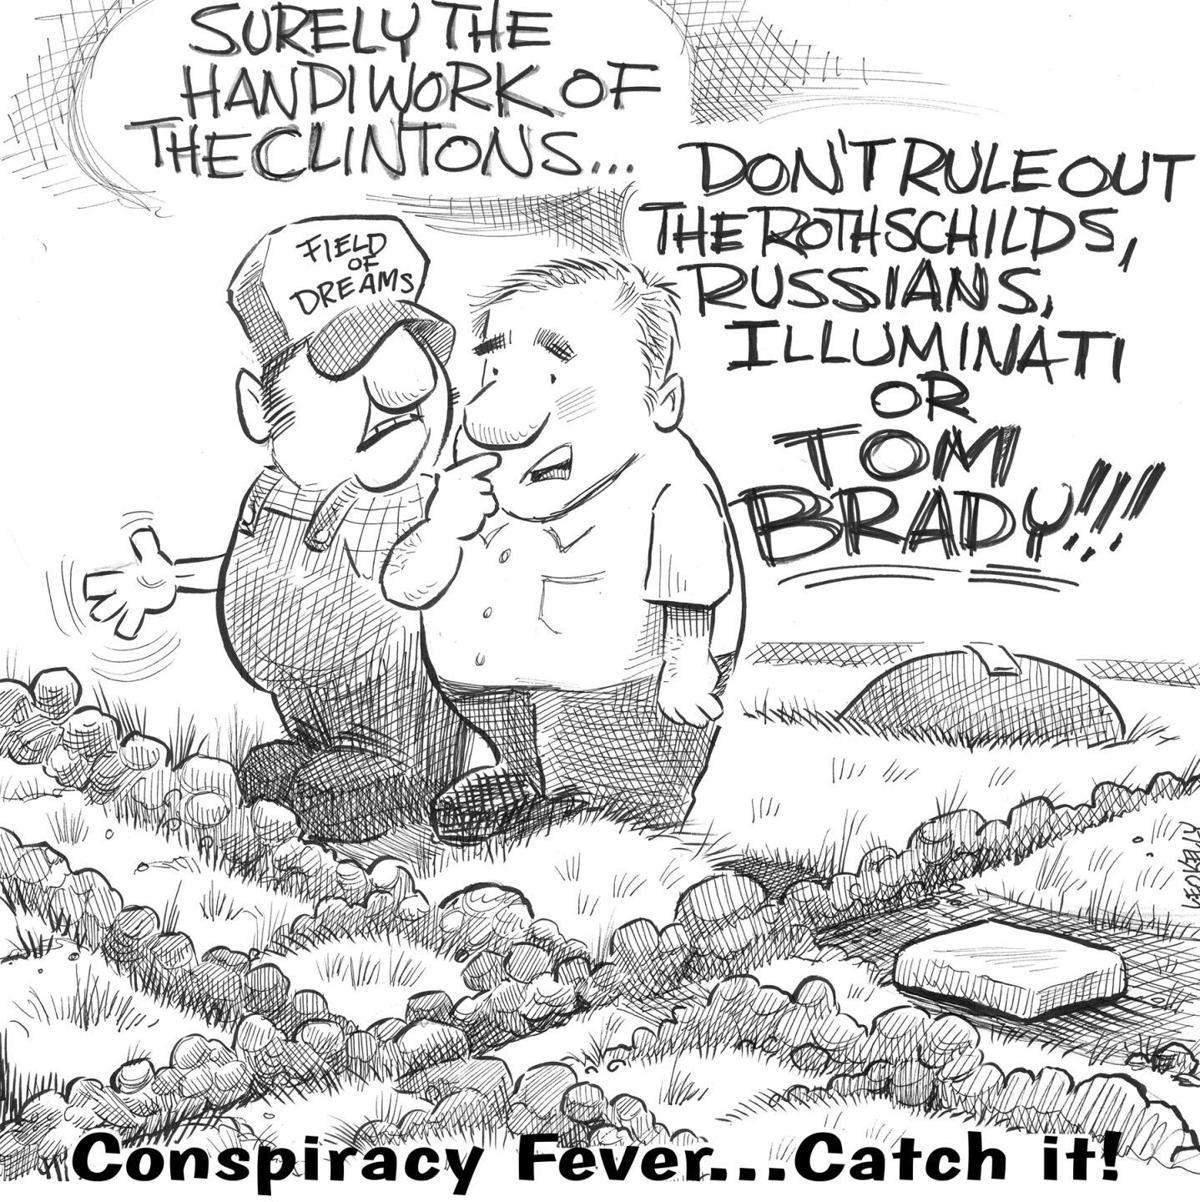 Sunday's cartoon